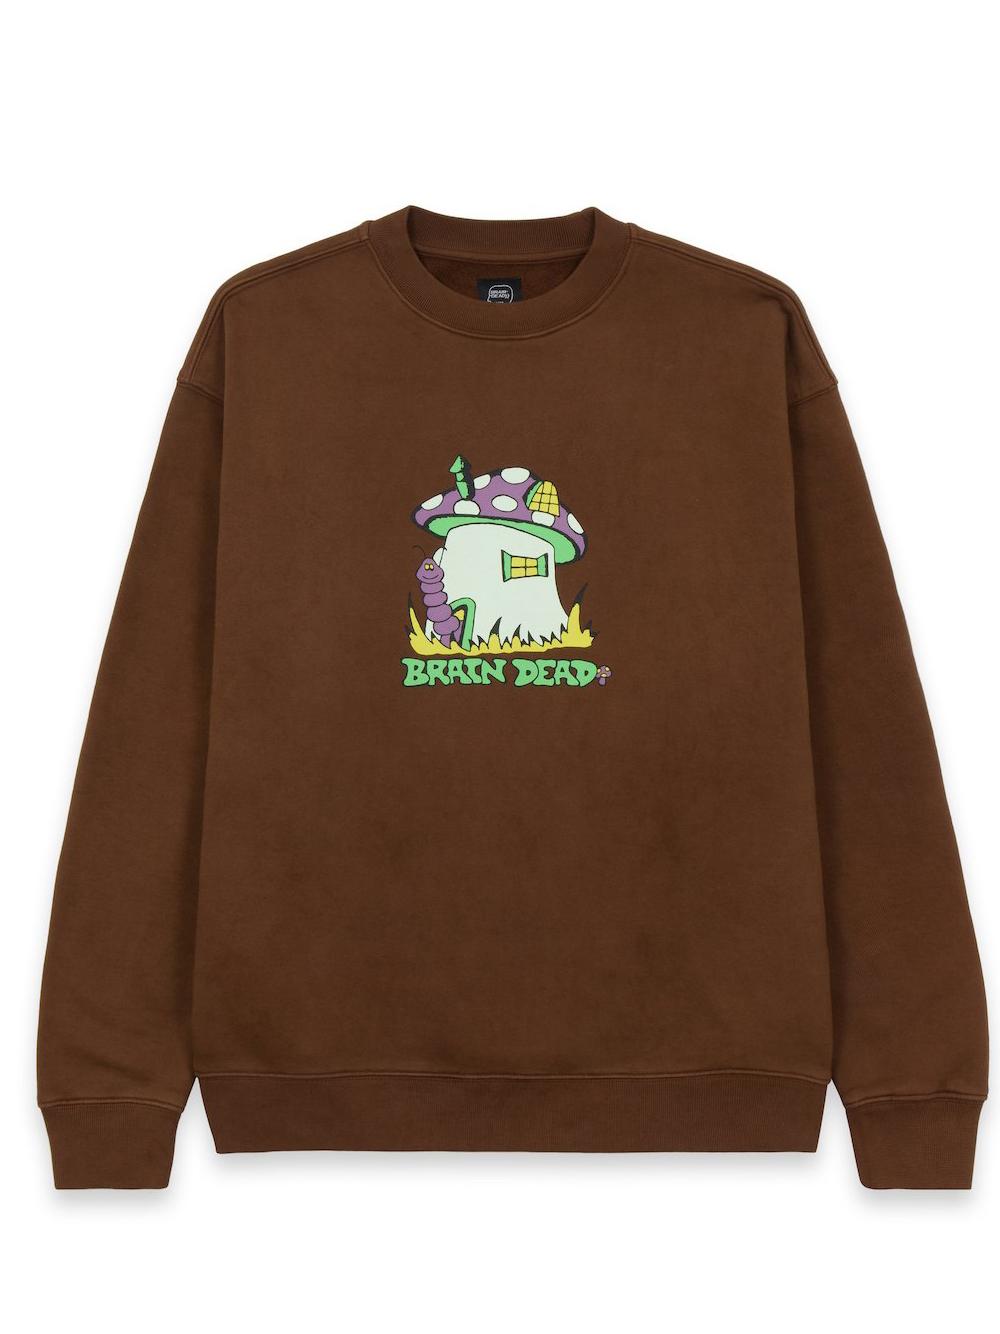 mushroom house crewneck man brown in cotton BRAIN DEAD | Sweaters | F21T10001945BROWN